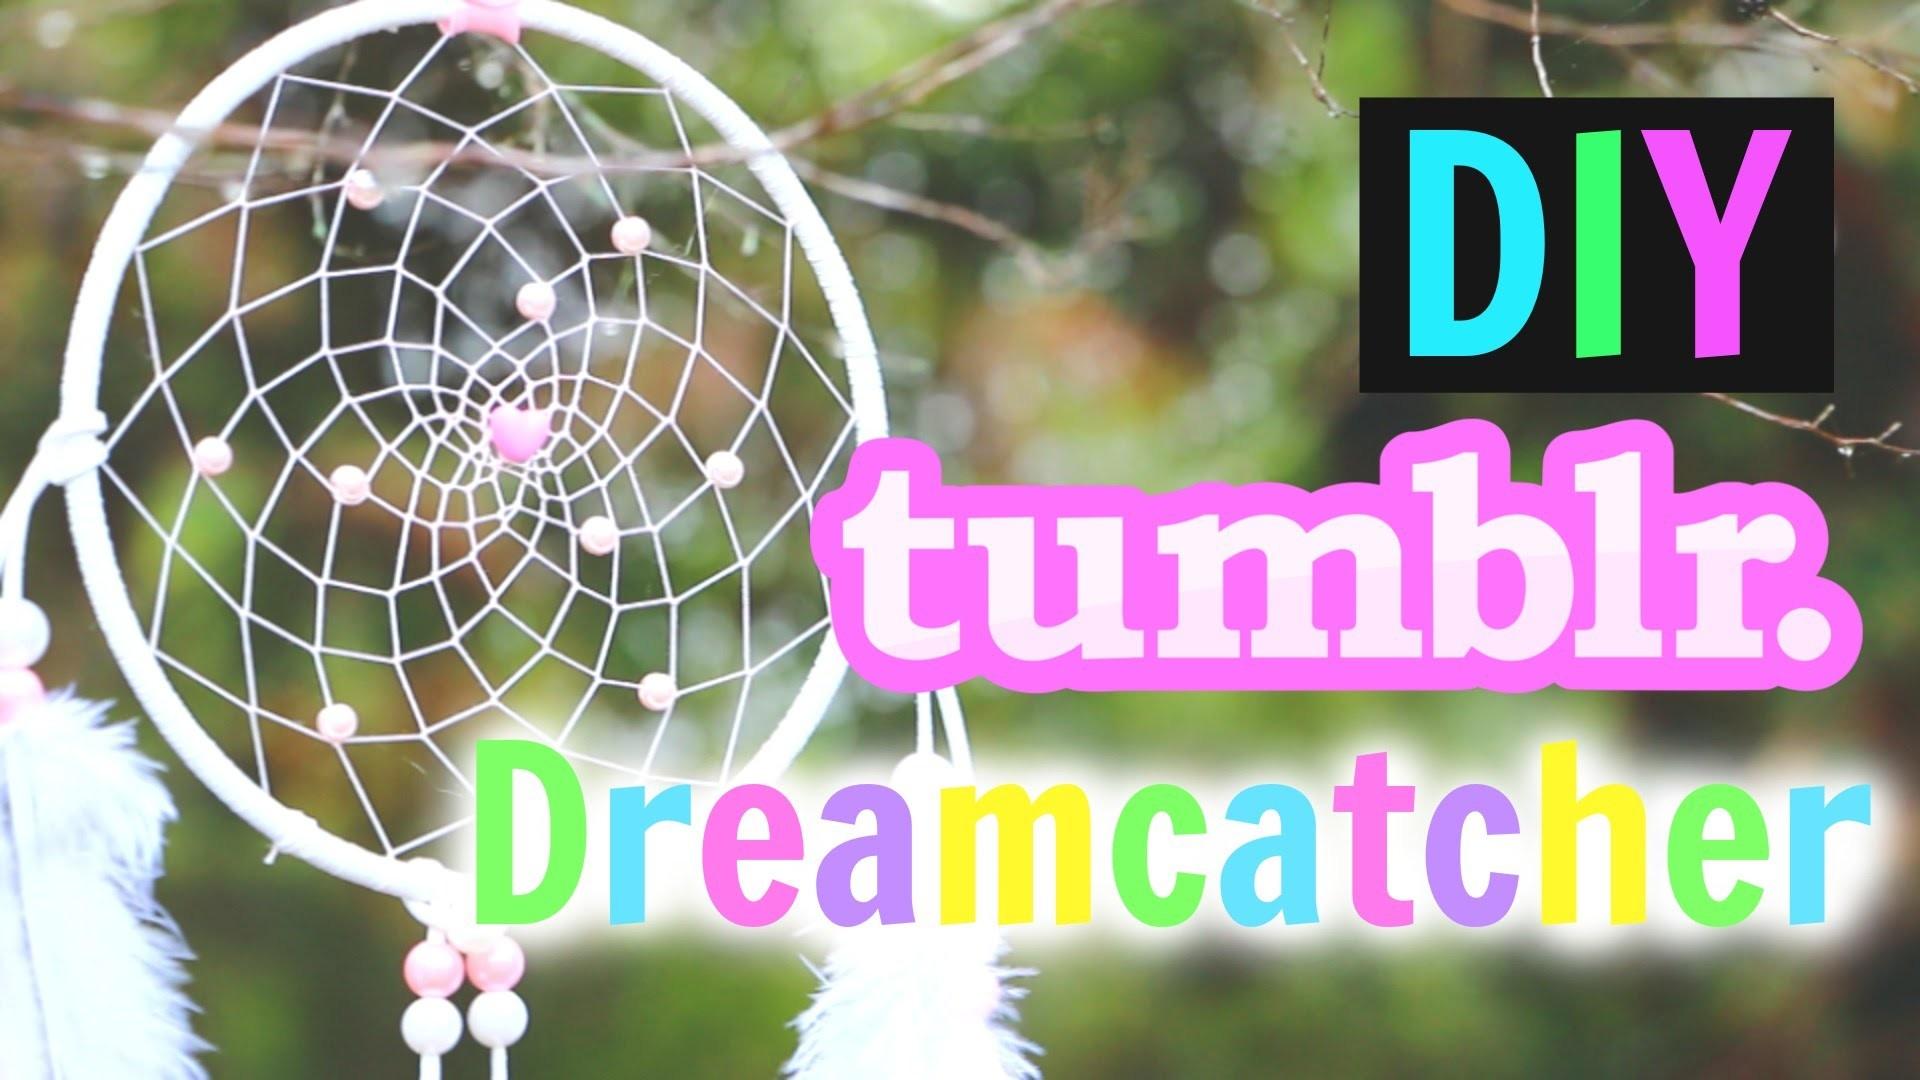 Hamsa Iphone Wallpaper Dreamcatcher Tumblr Background 183 ① Wallpapertag